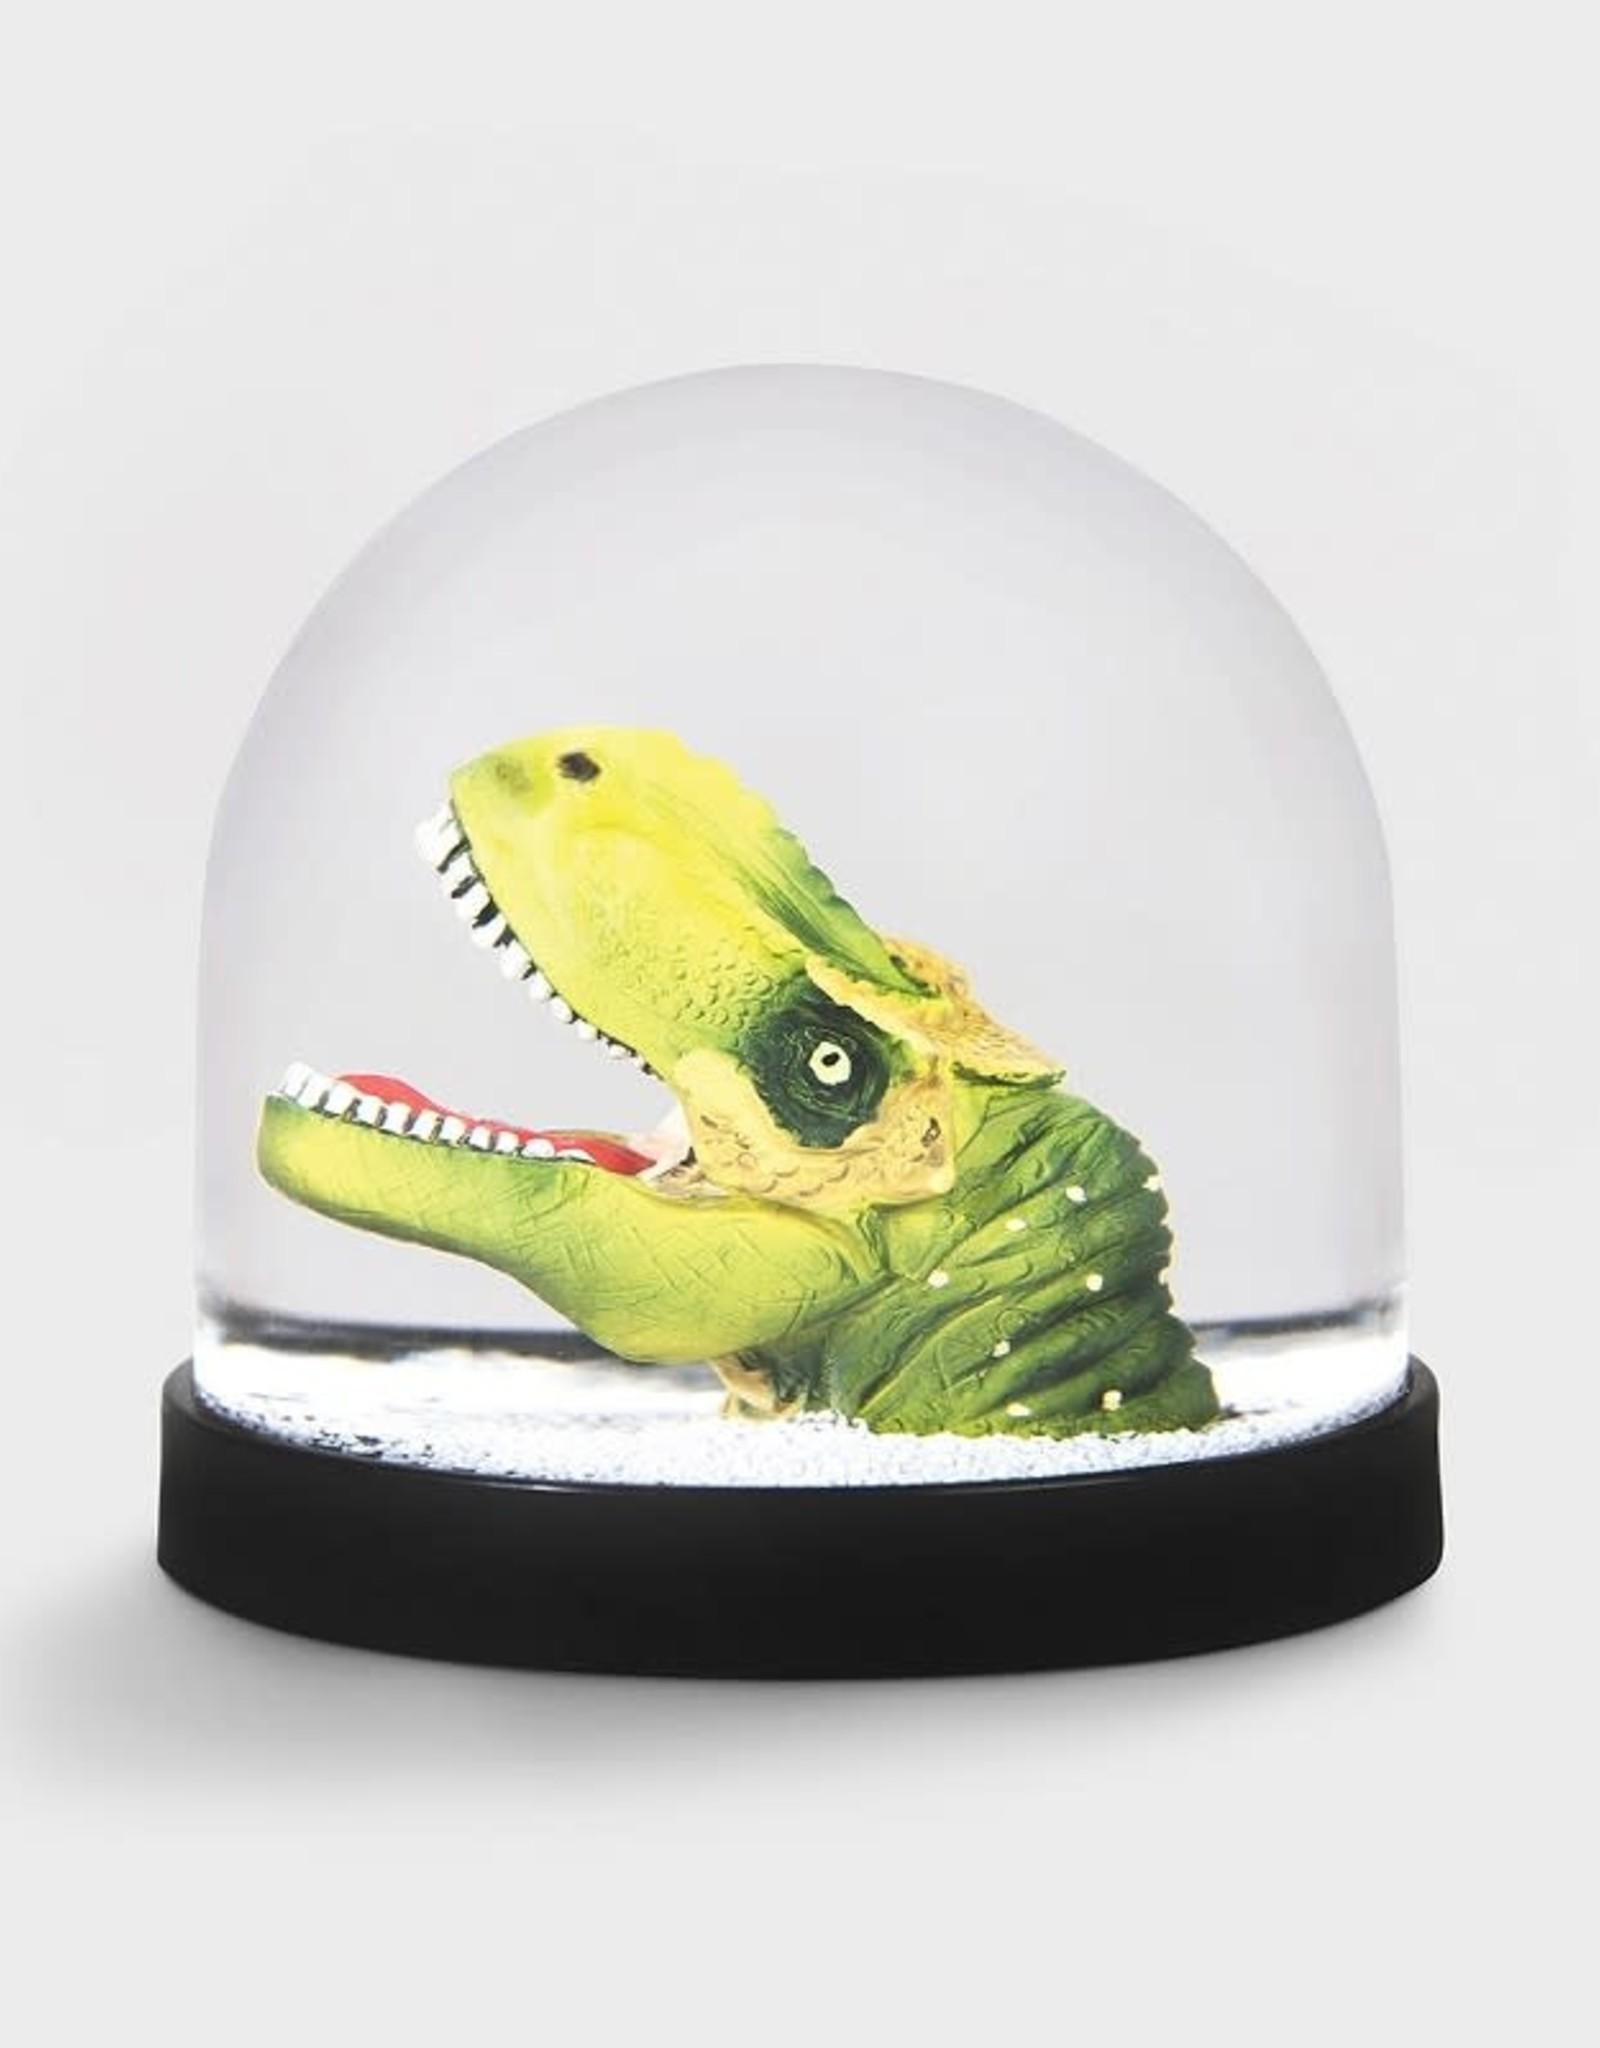 & klevering Boule à neige Wonderball Dinosaur